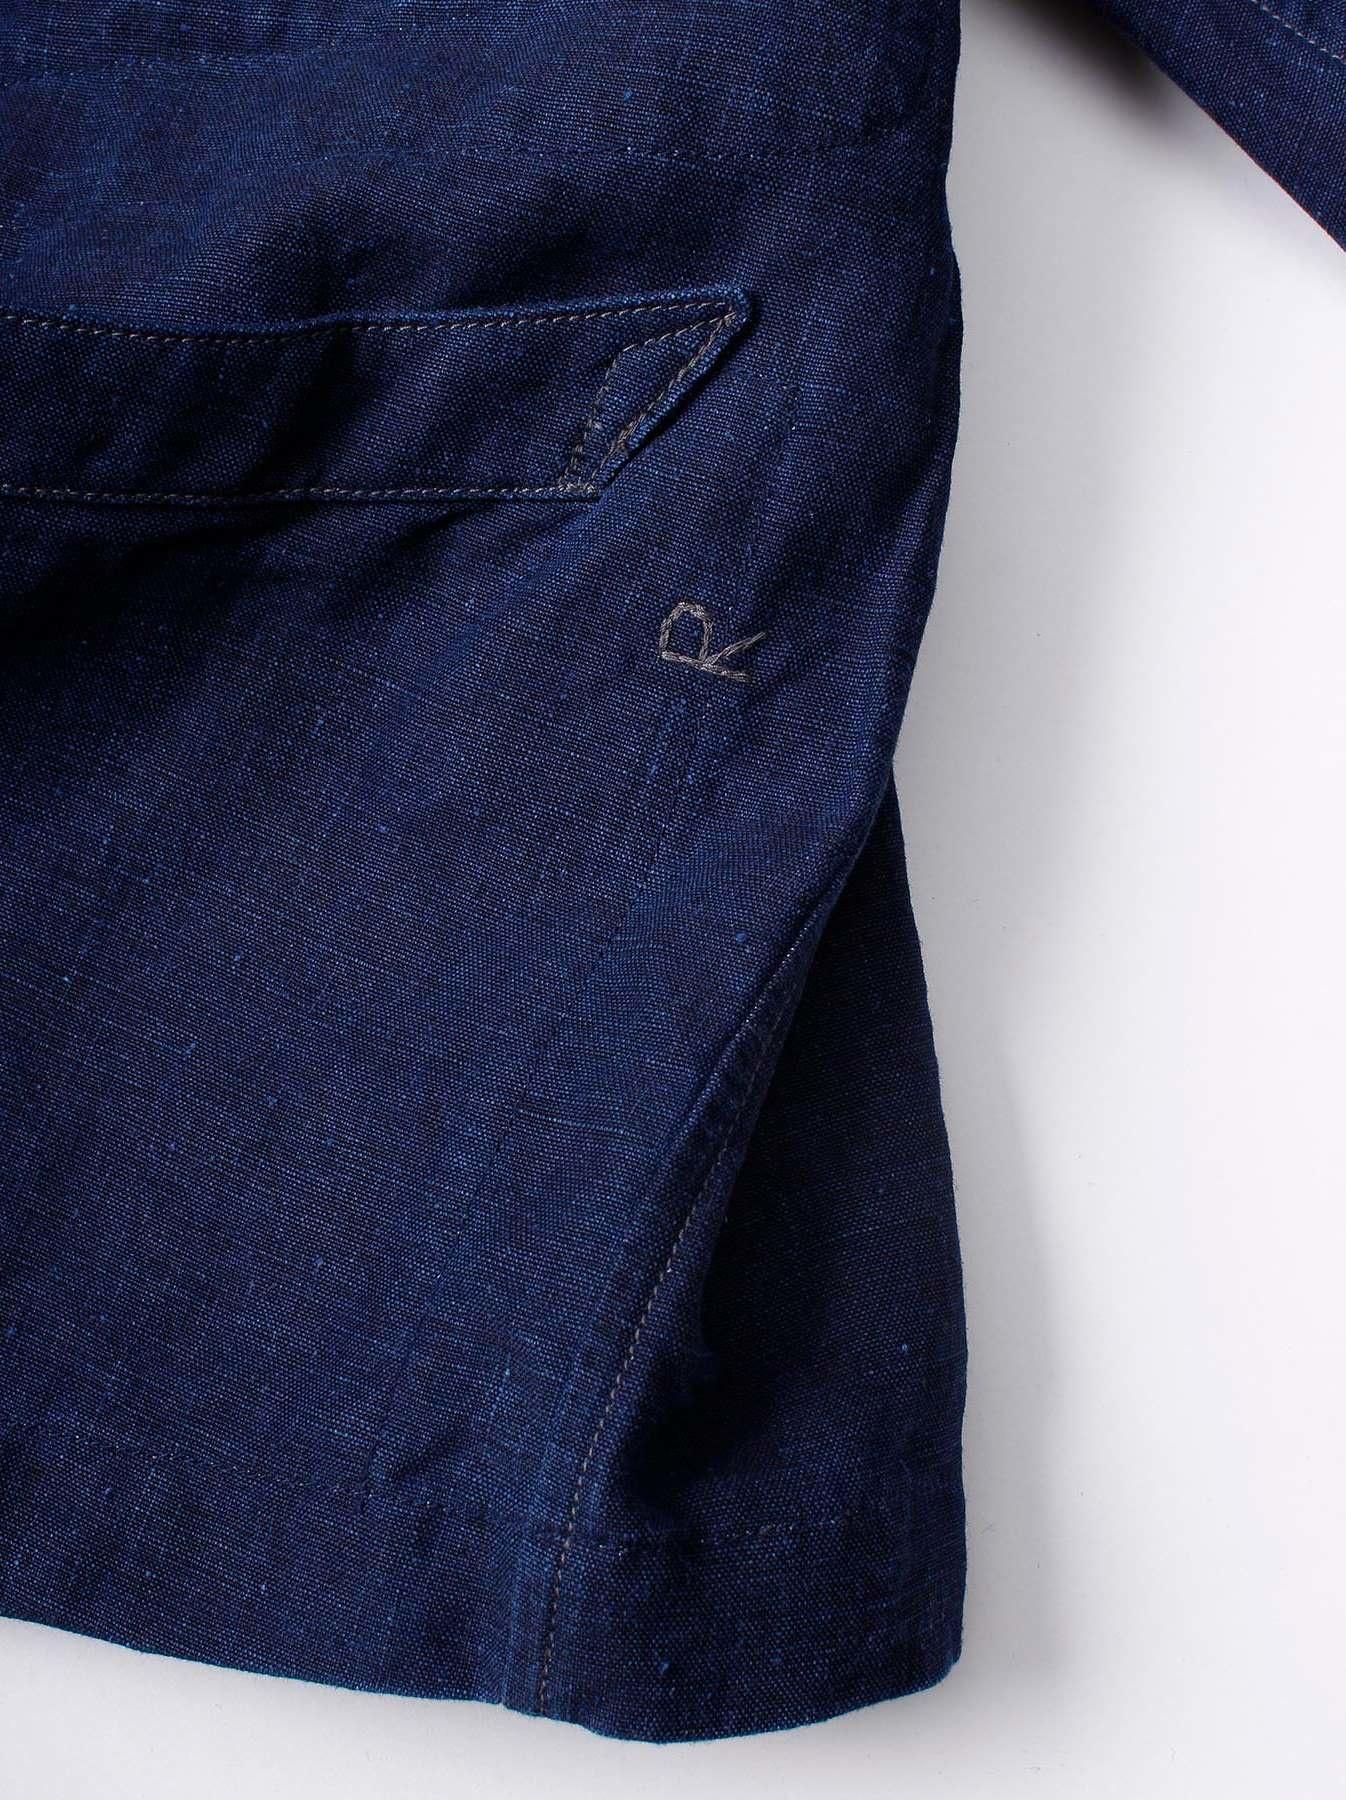 WH Indigo Linen Stand Collar Jacket-10